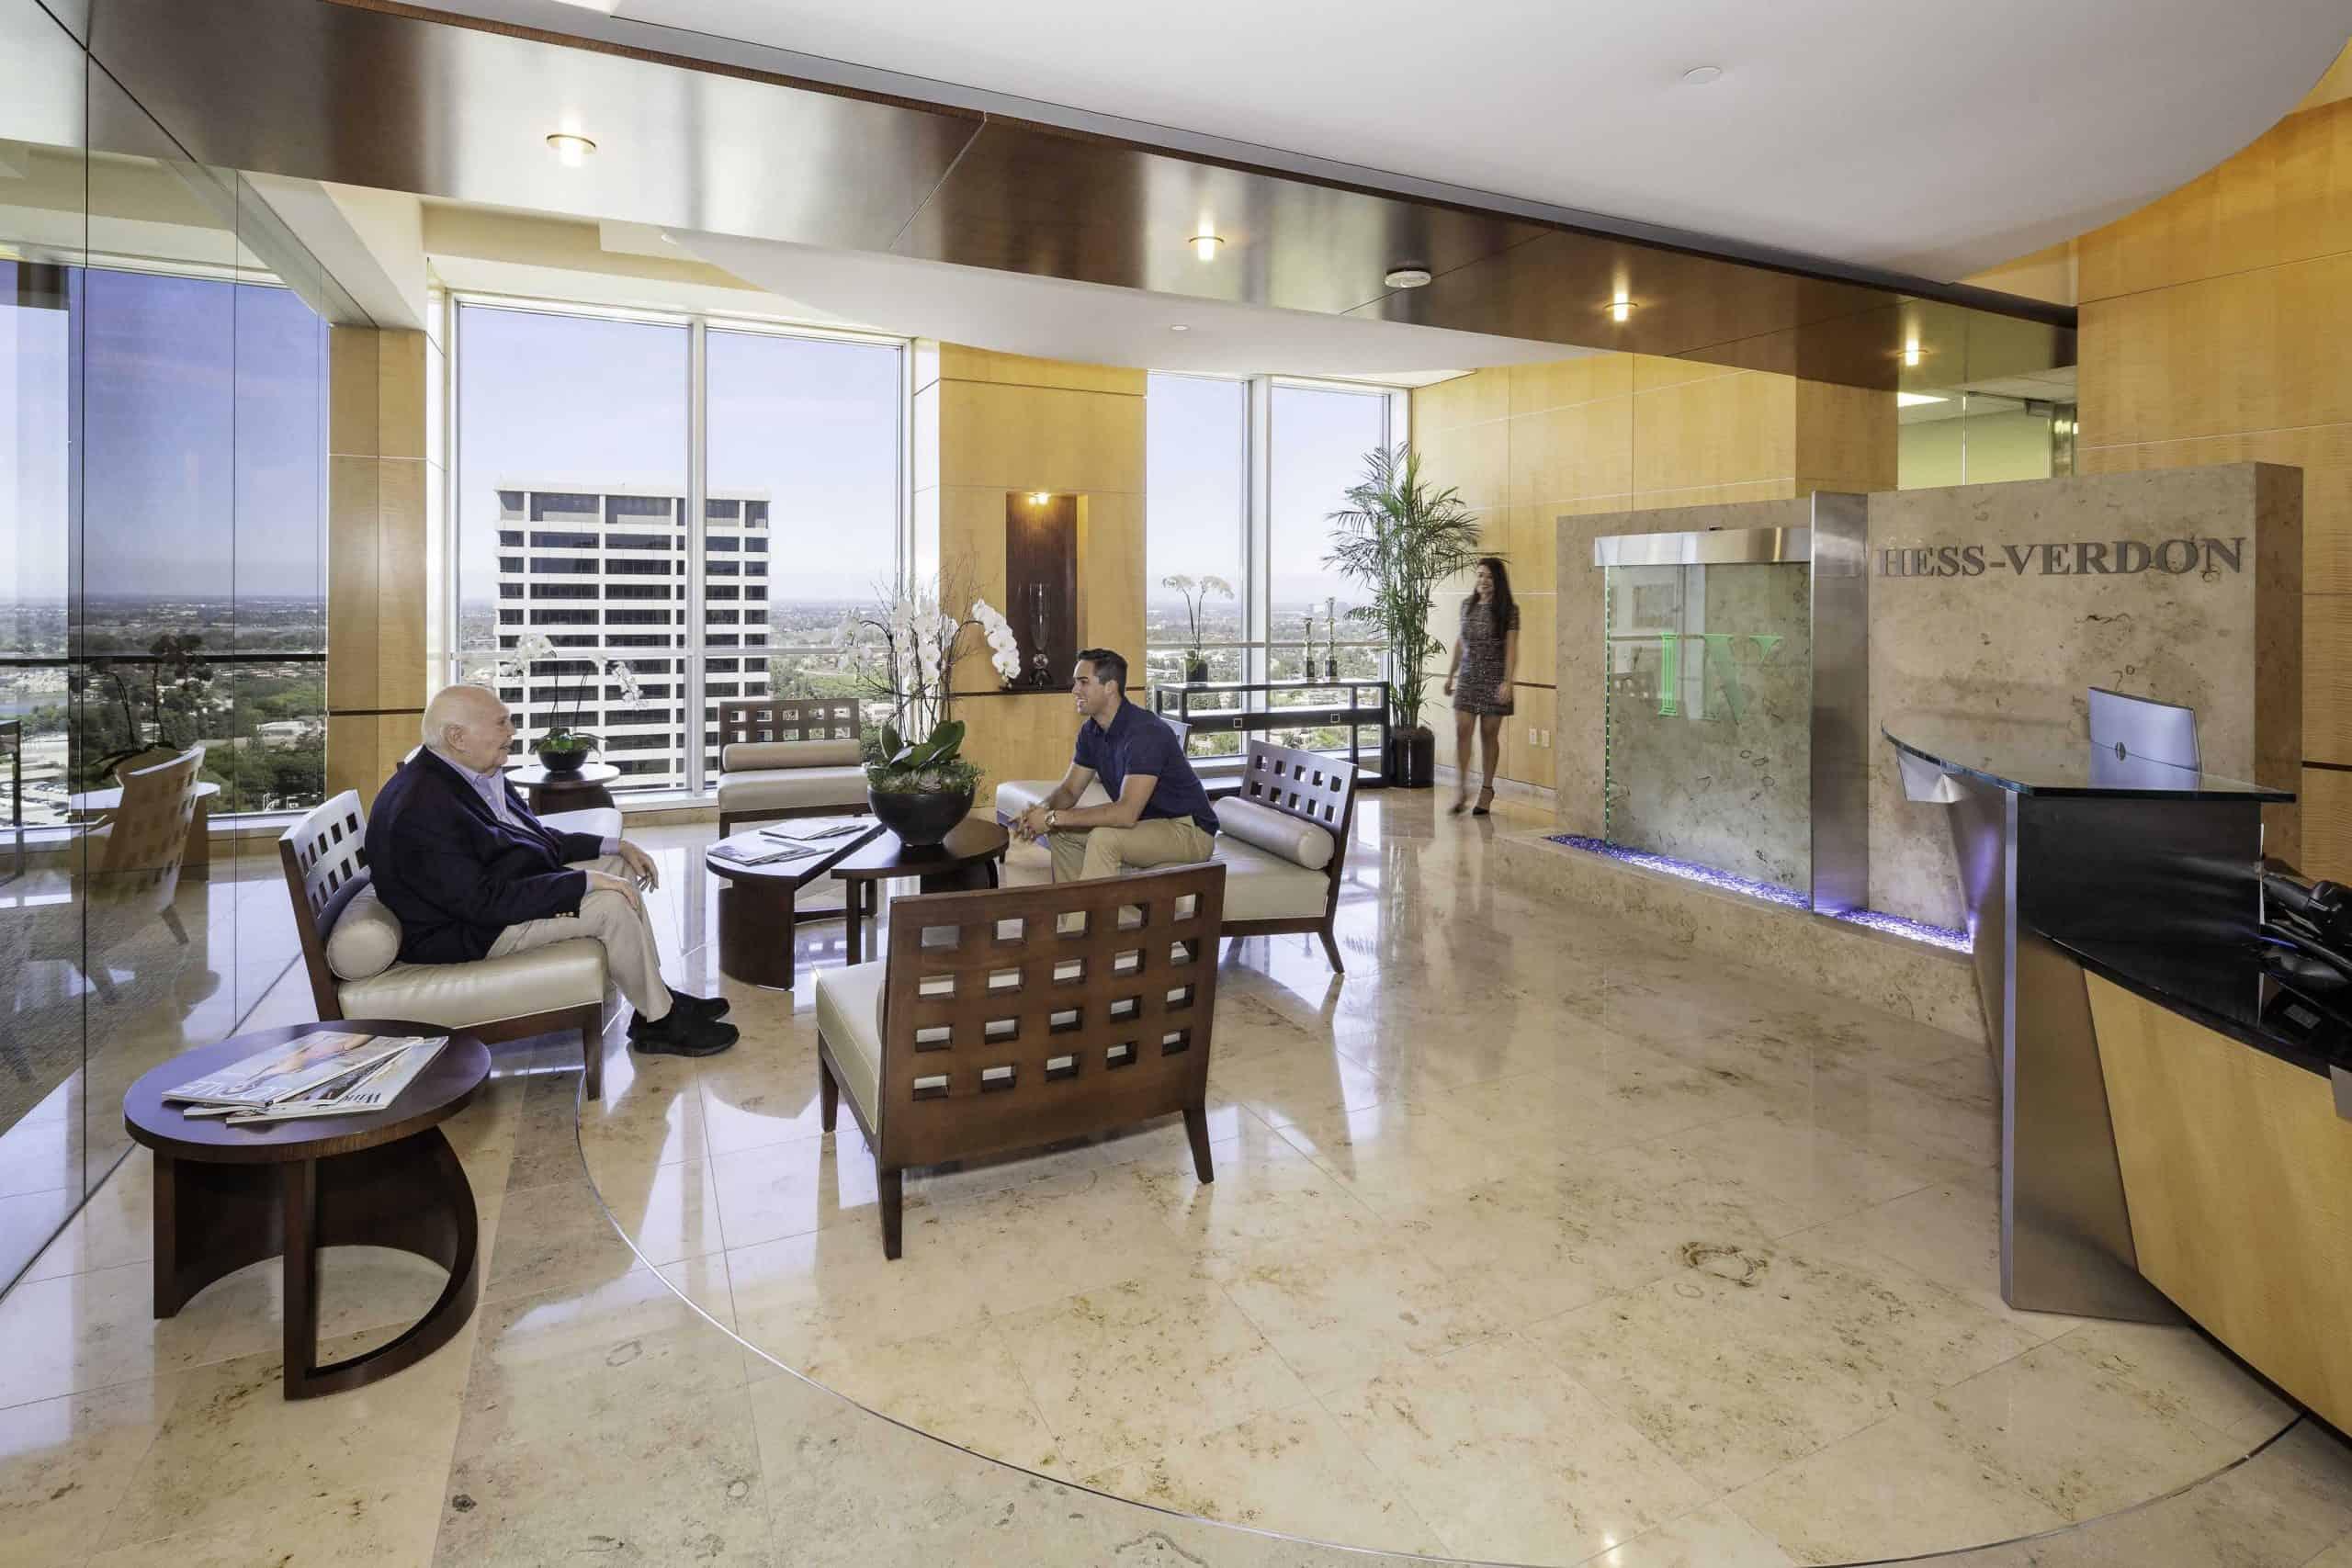 trust litigation attorney scaled Orange County Estate Planning Law Firm | Hess-Verdon & Associates